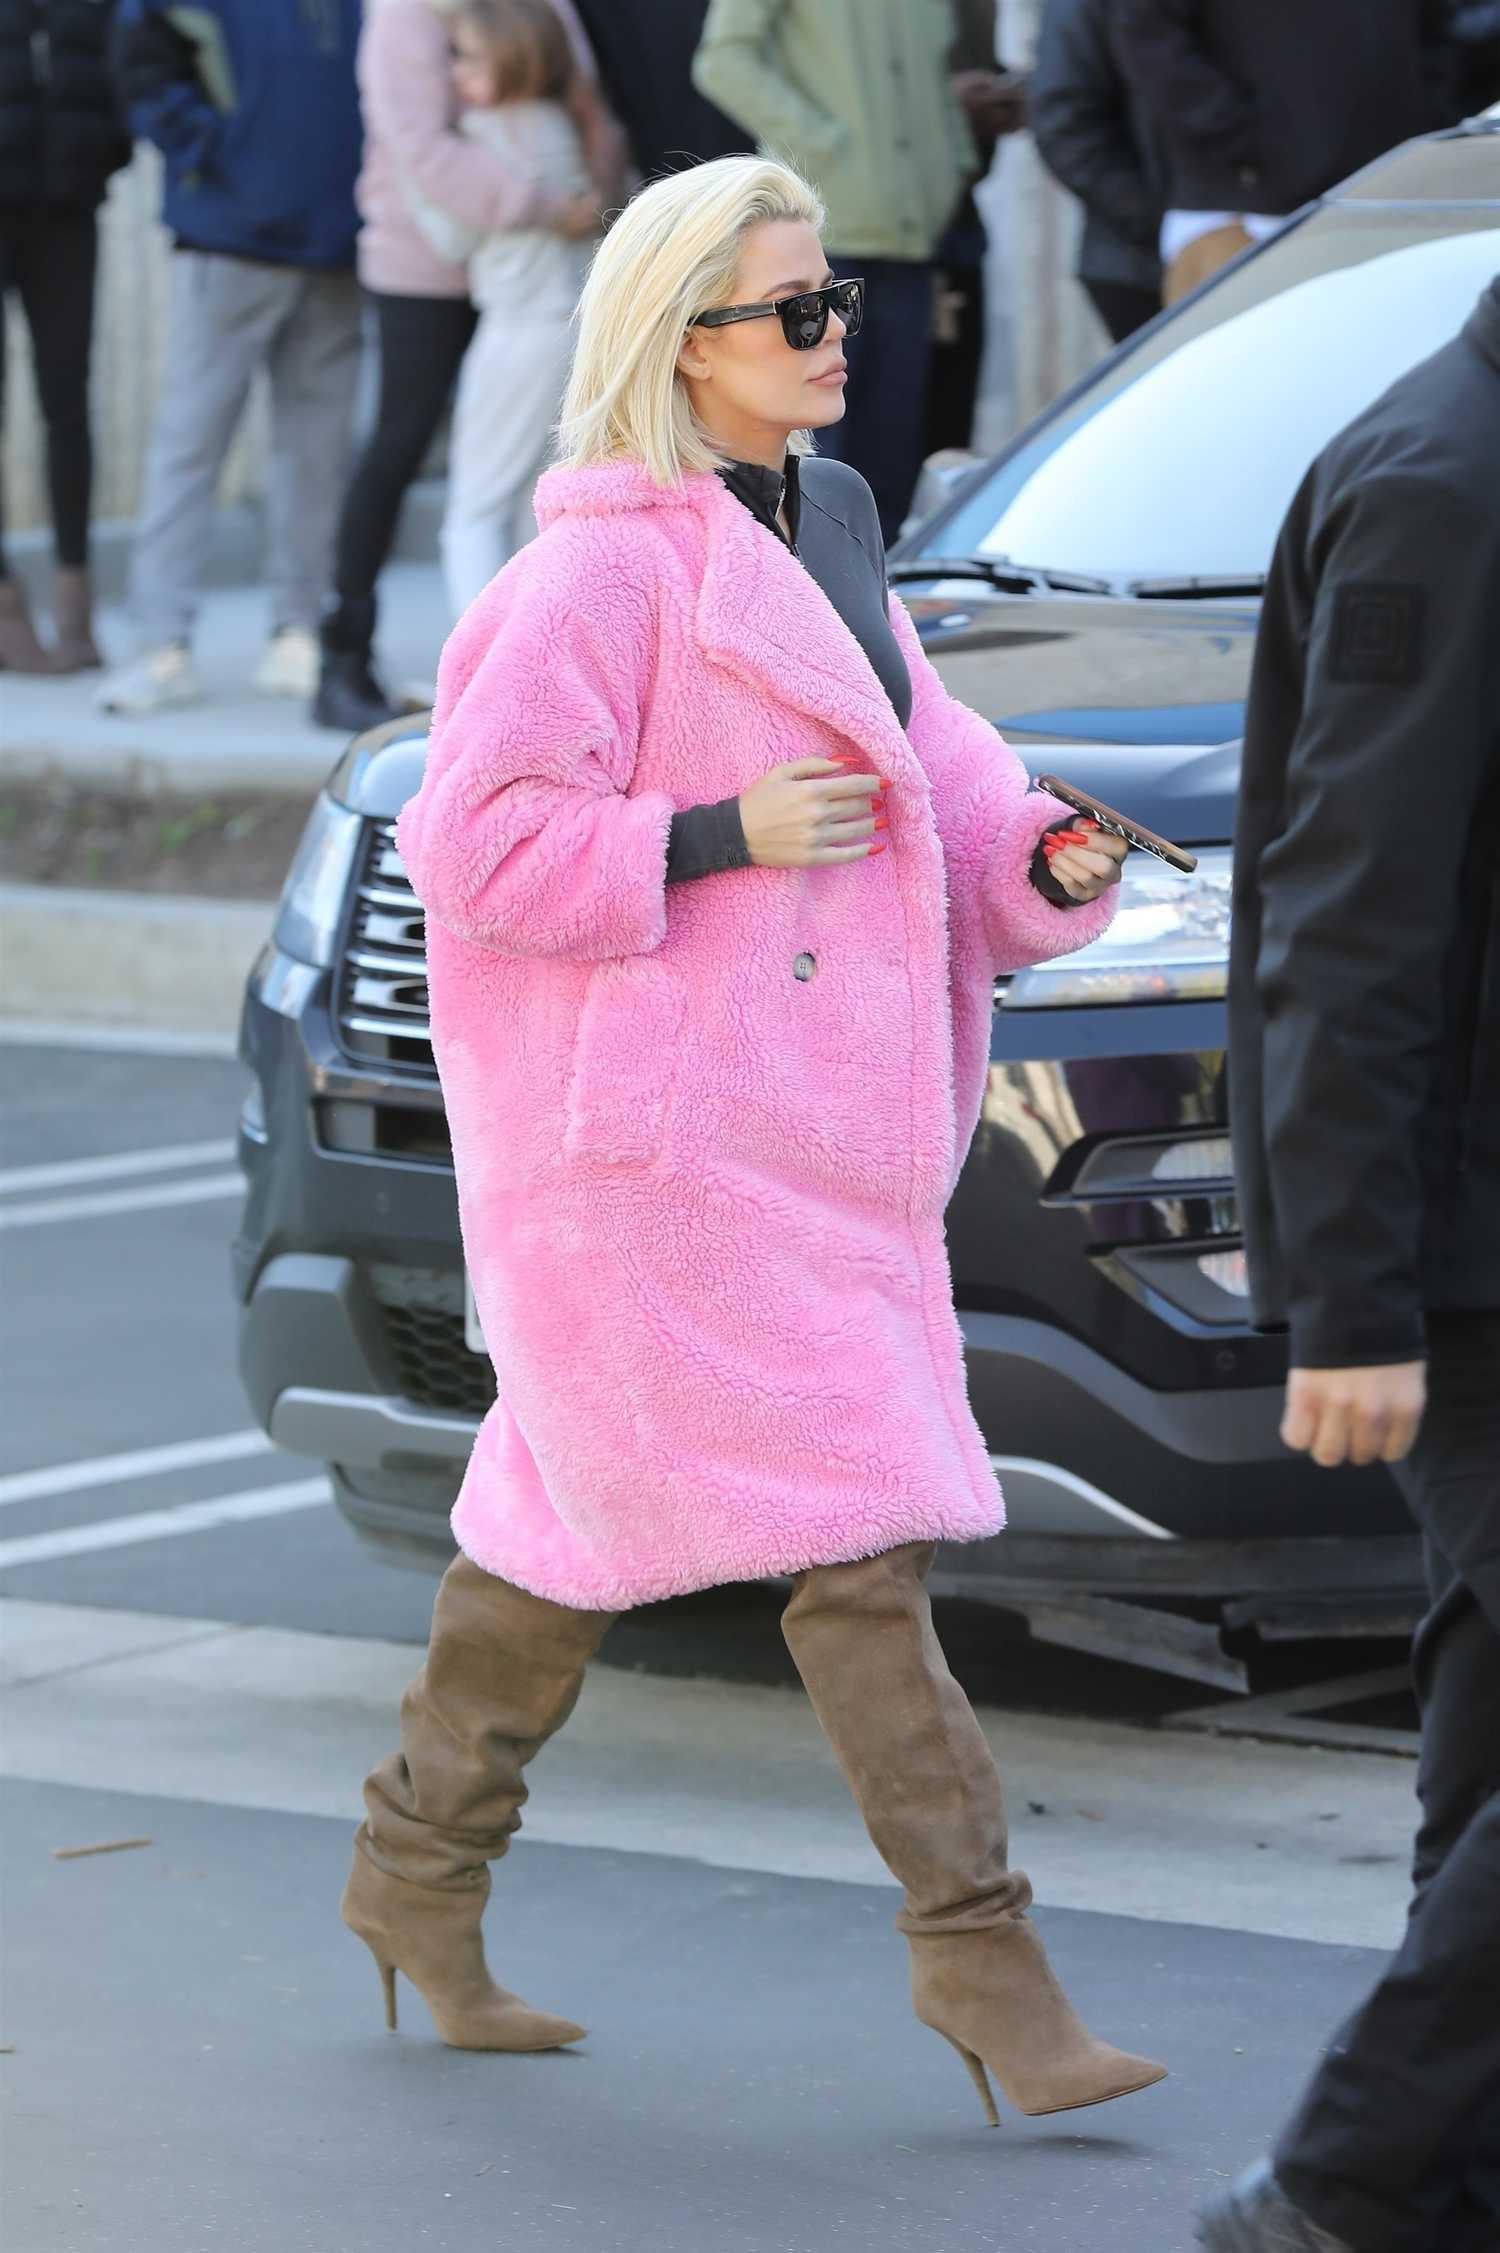 Khloe Kardashian In A Pink Fur Coat Was Seen Out In